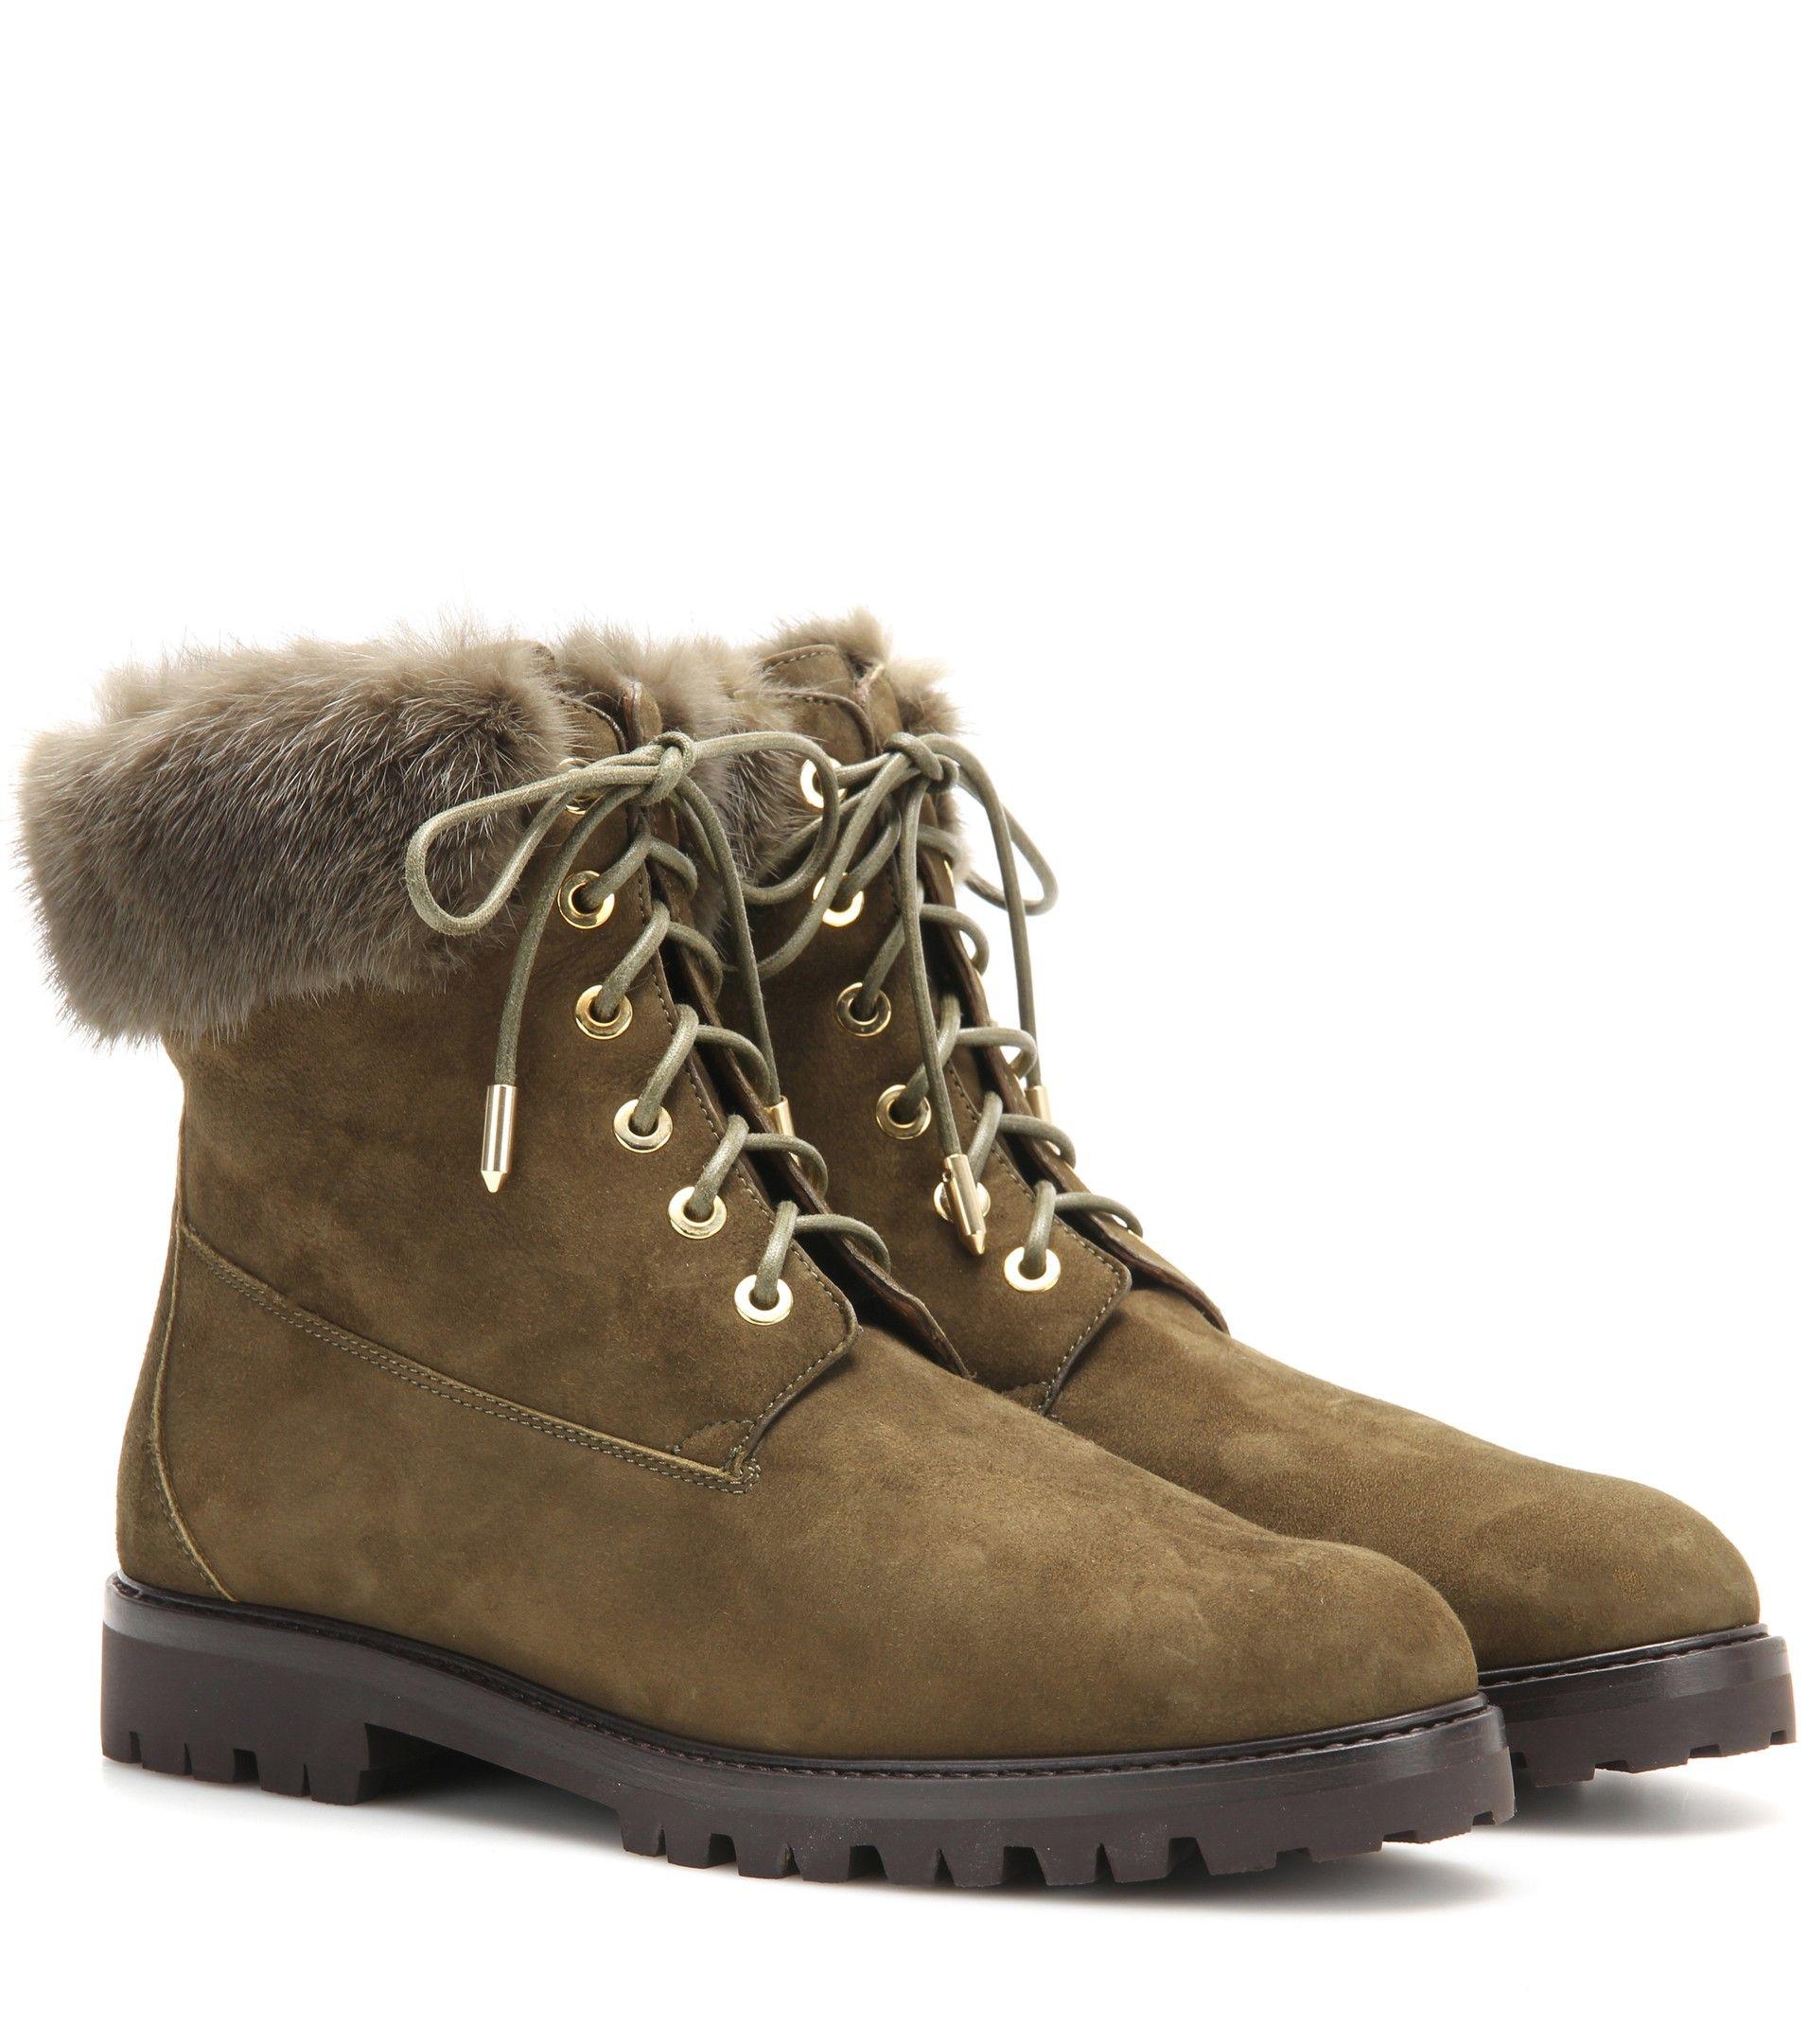 Aquazzura The Heilbrunner fur-trimmed suede boots Military Green $149.00